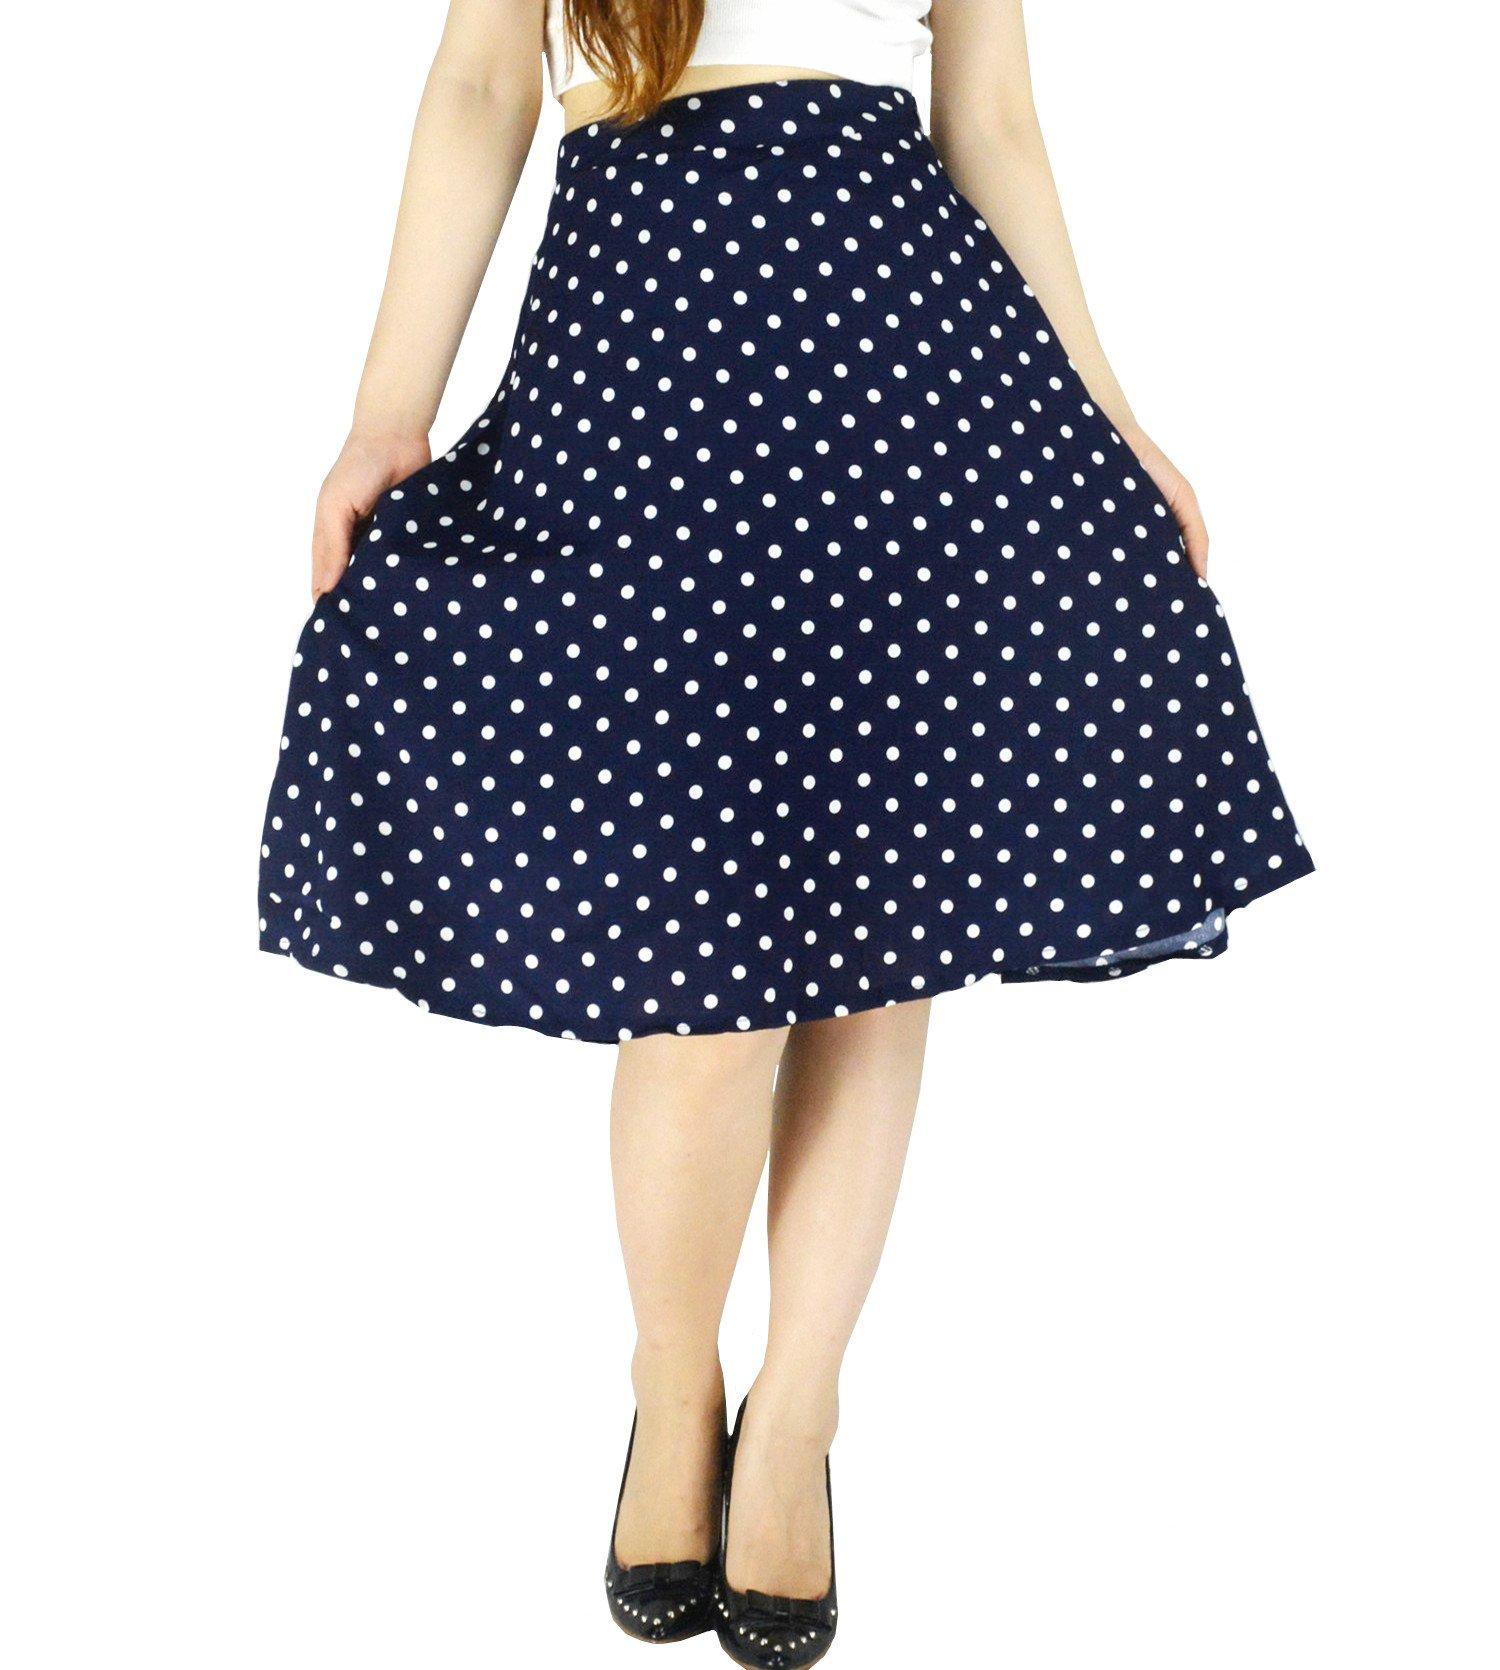 YSJ Women's Polka Dot Chiffon Mini Skirt Chic Summer A Line Swing Skirts (S, Navy Blue)